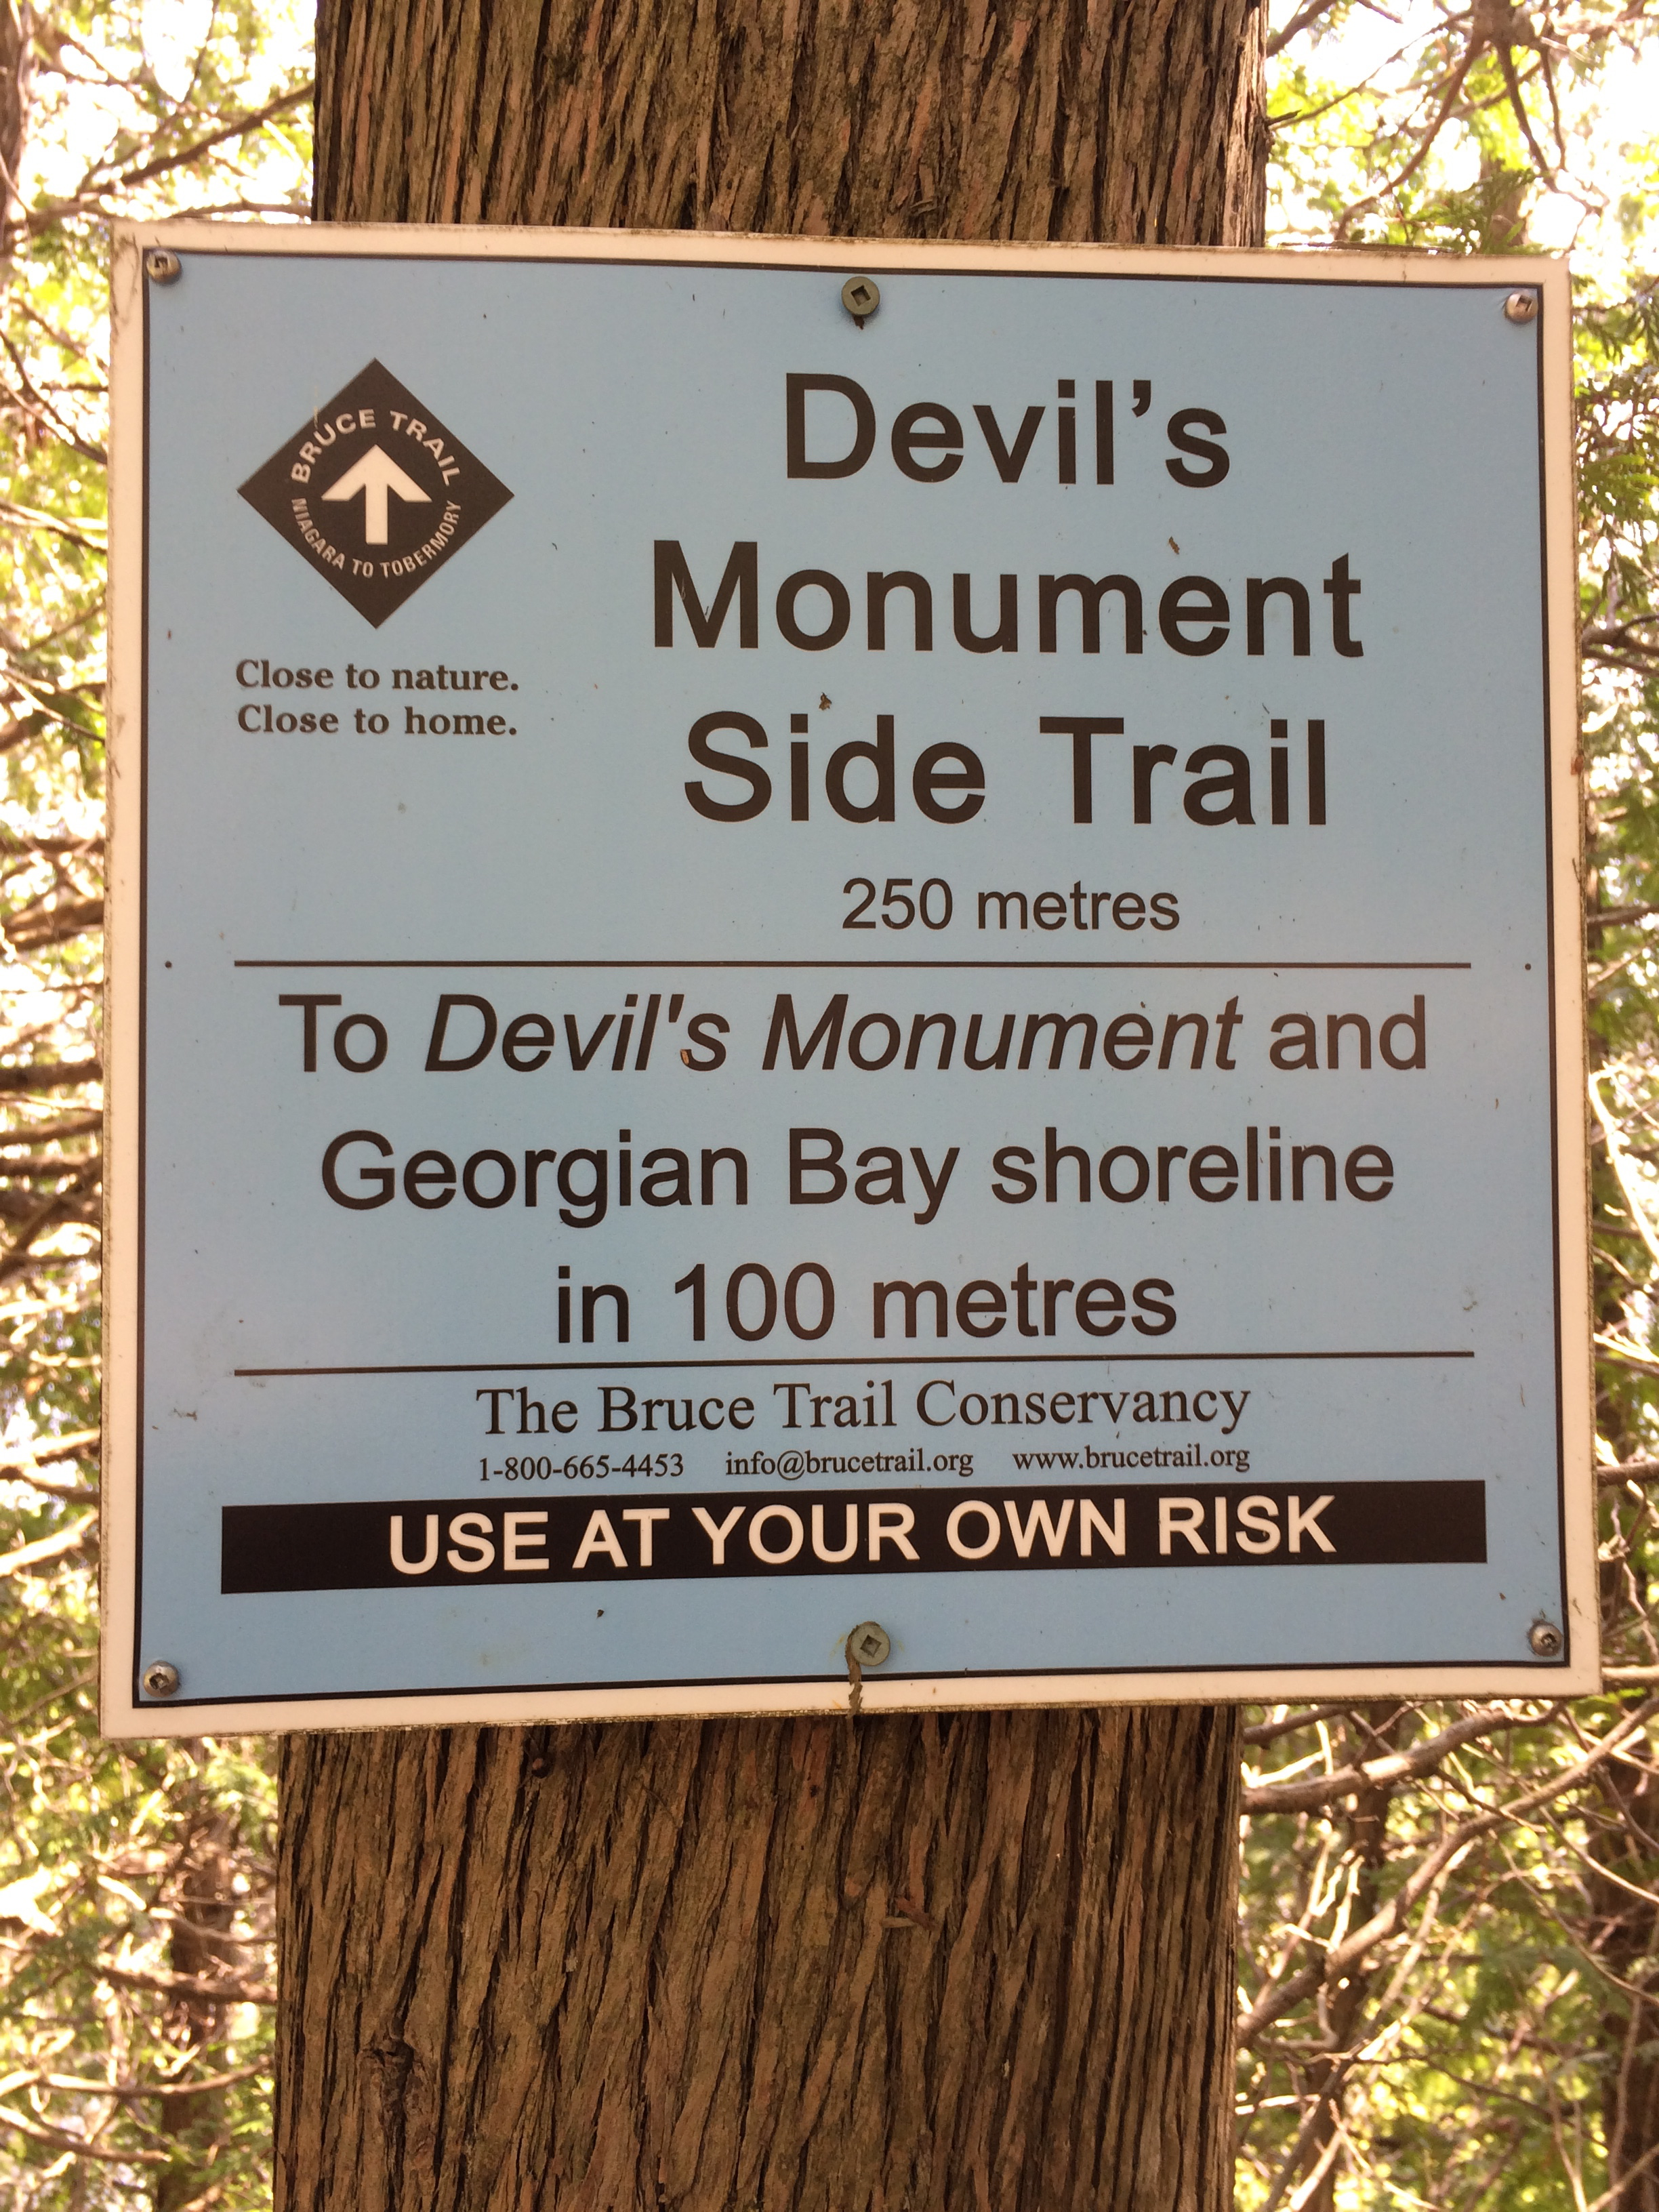 Devils monument trail